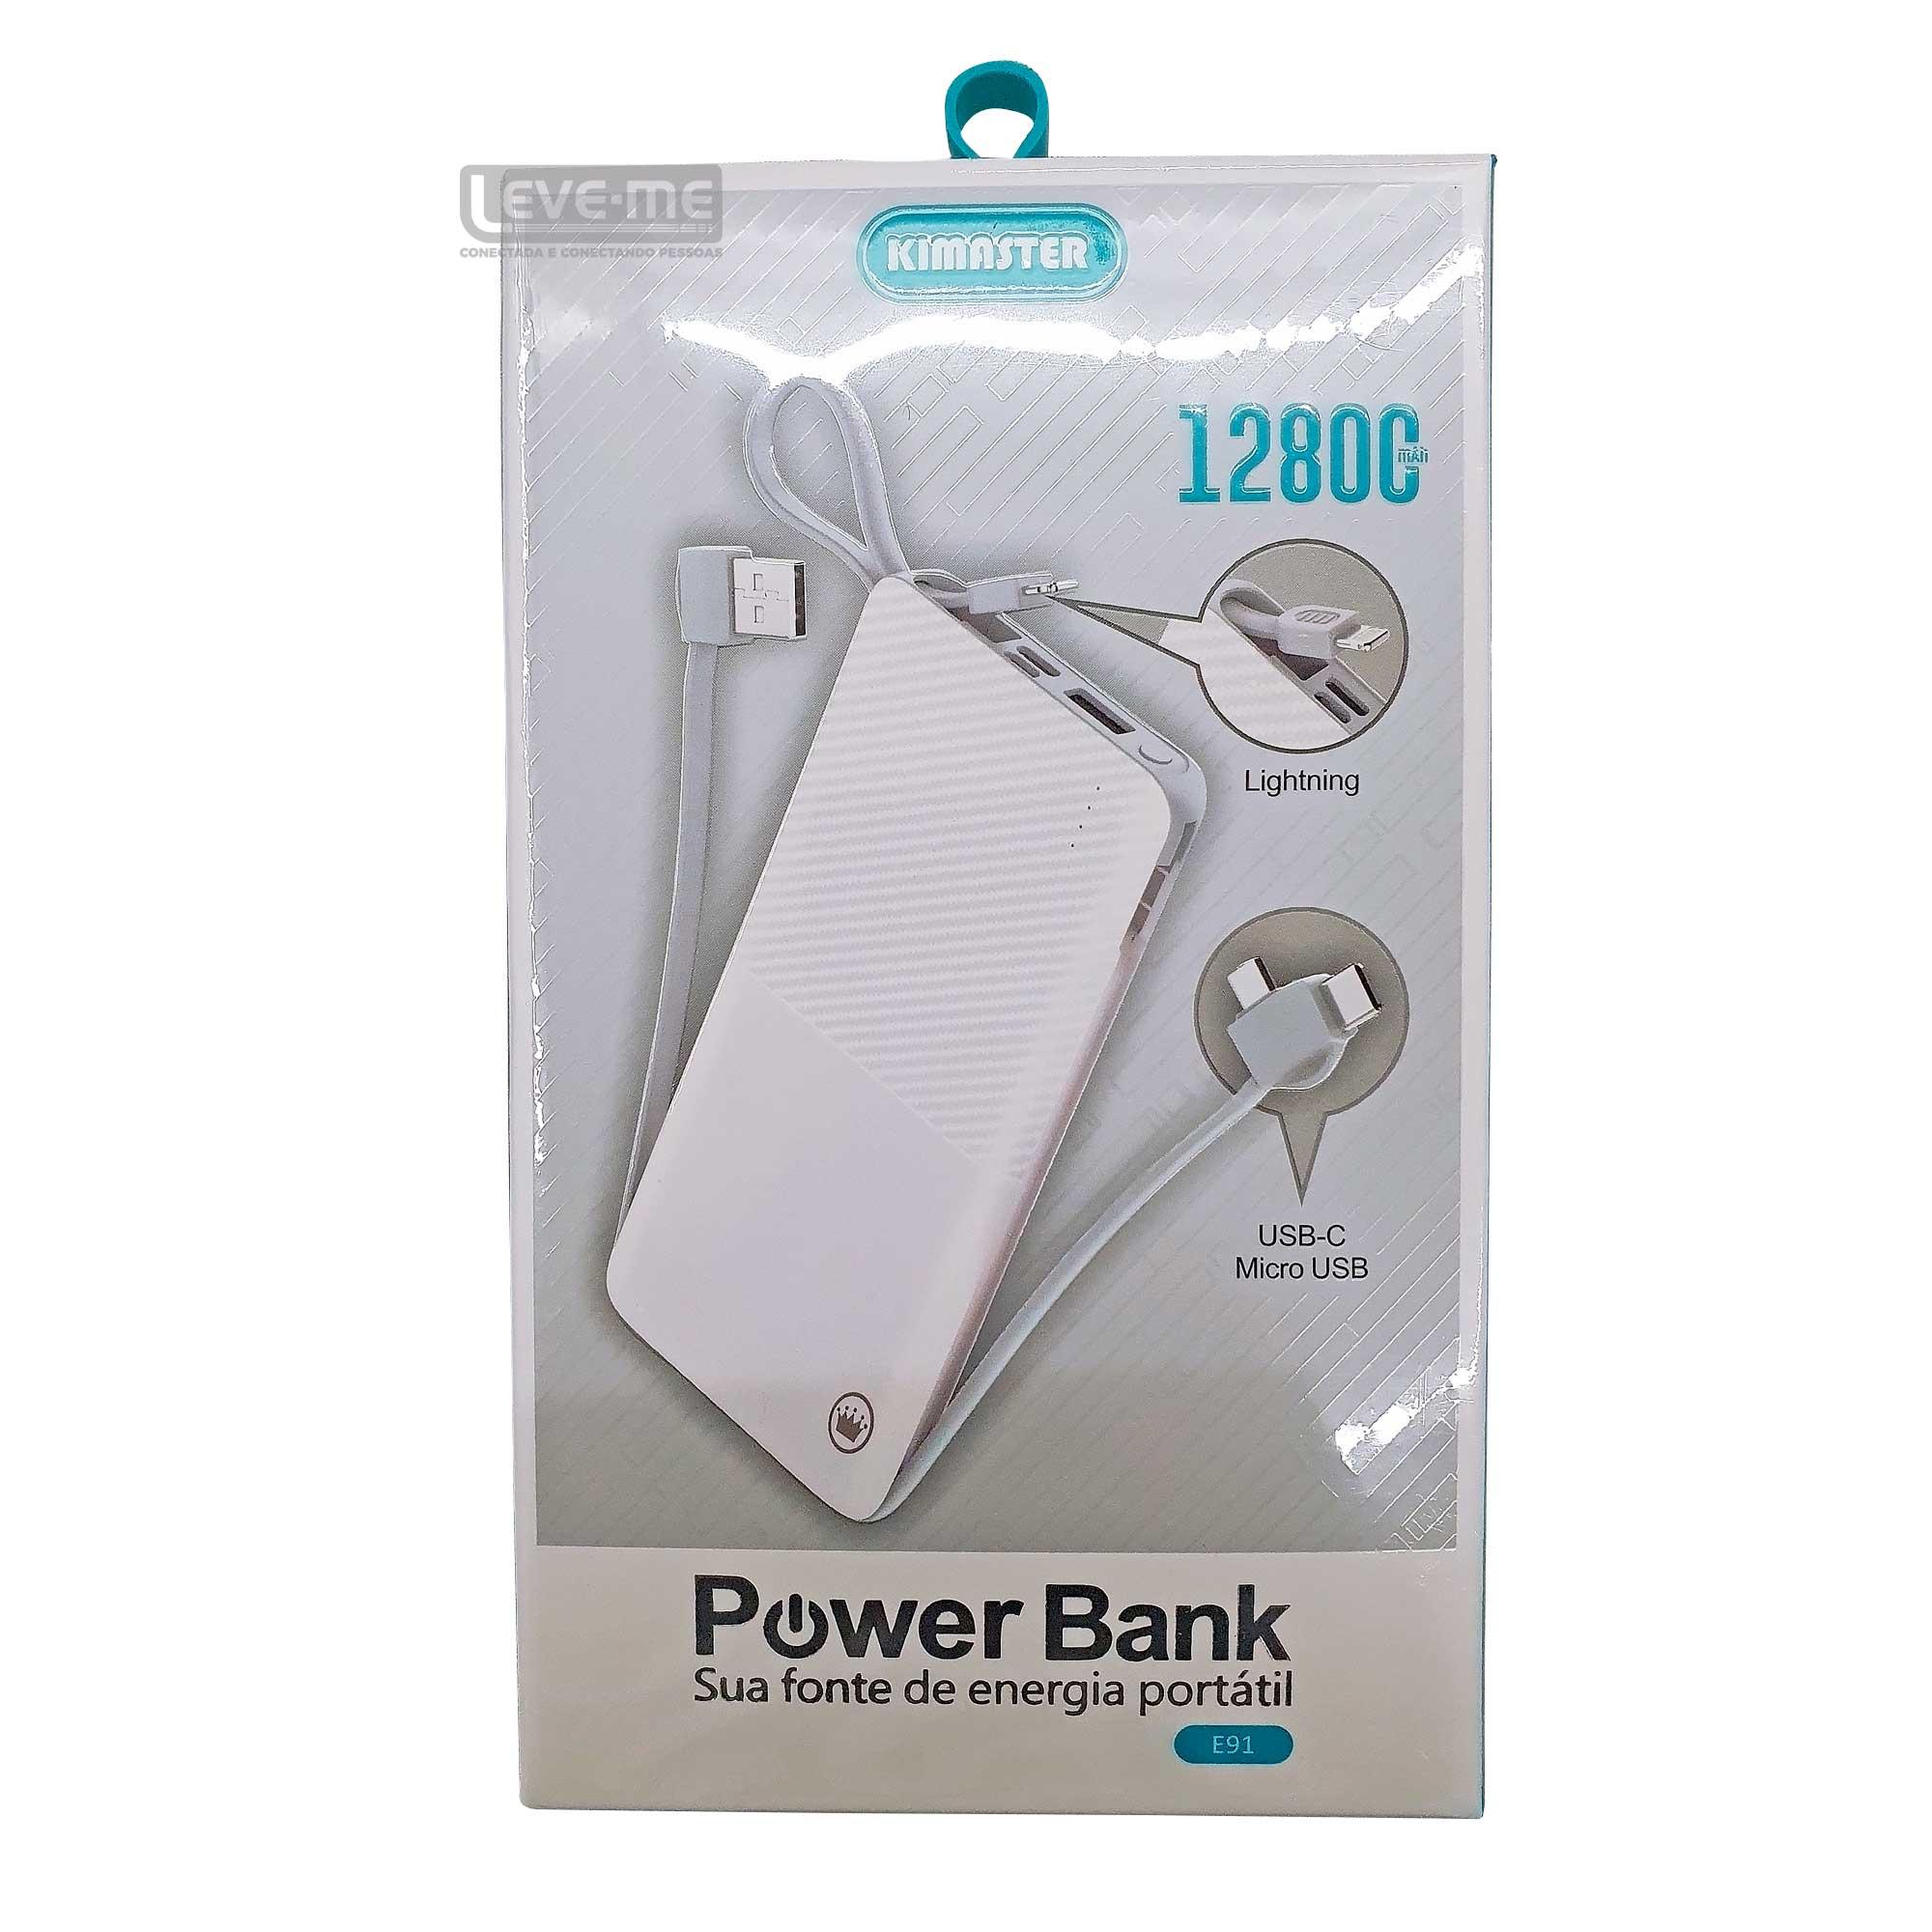 Power Bank Slim com cabo removível